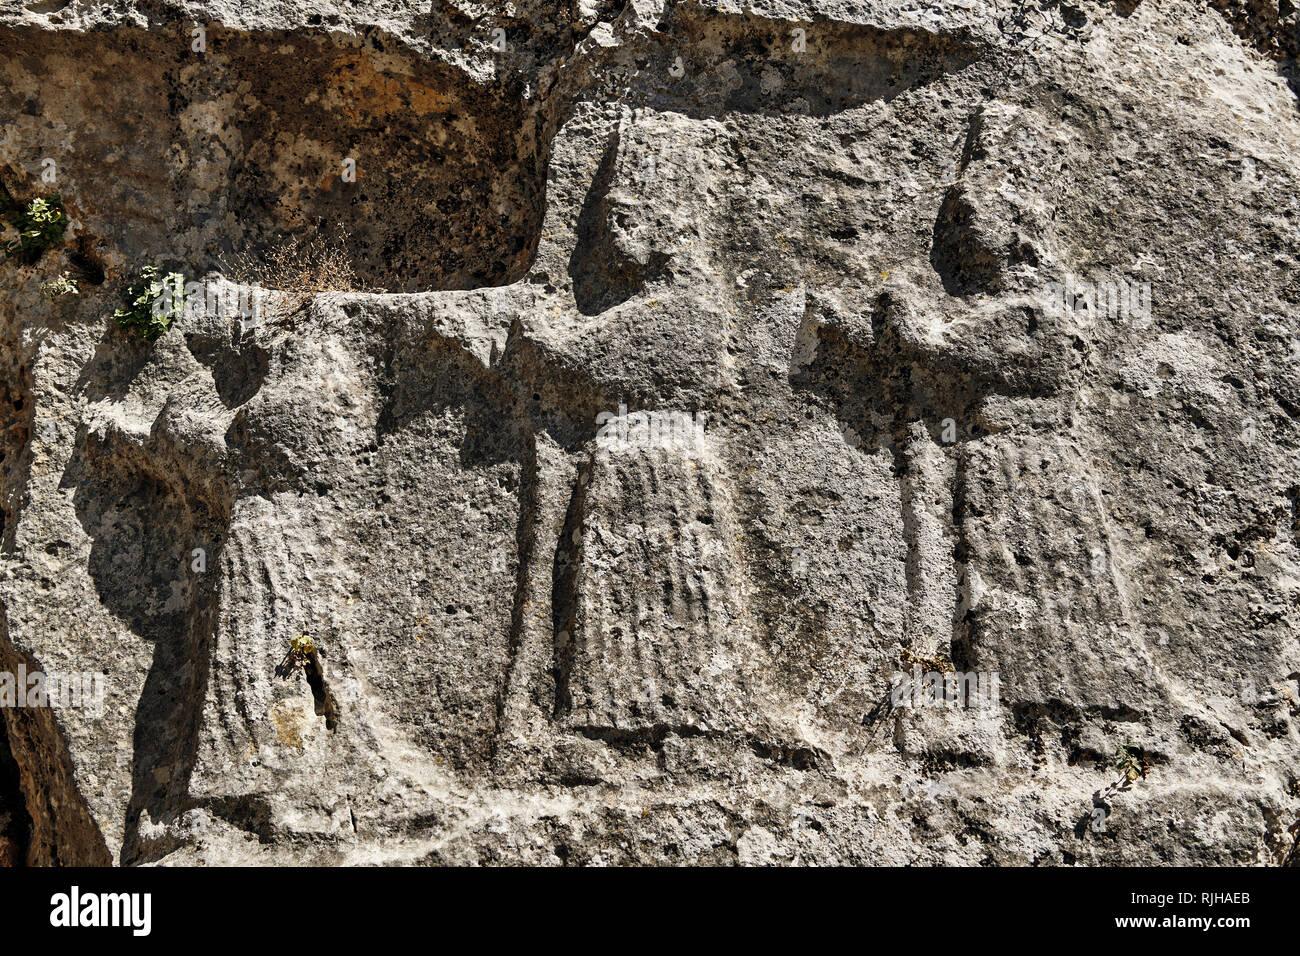 Procession of female Gods in the 13th century BC Hittite religious rock carvings of Yazılıkaya Hittite rock sanctuary, chamber A,  Hattusa, Bogazale,  - Stock Image